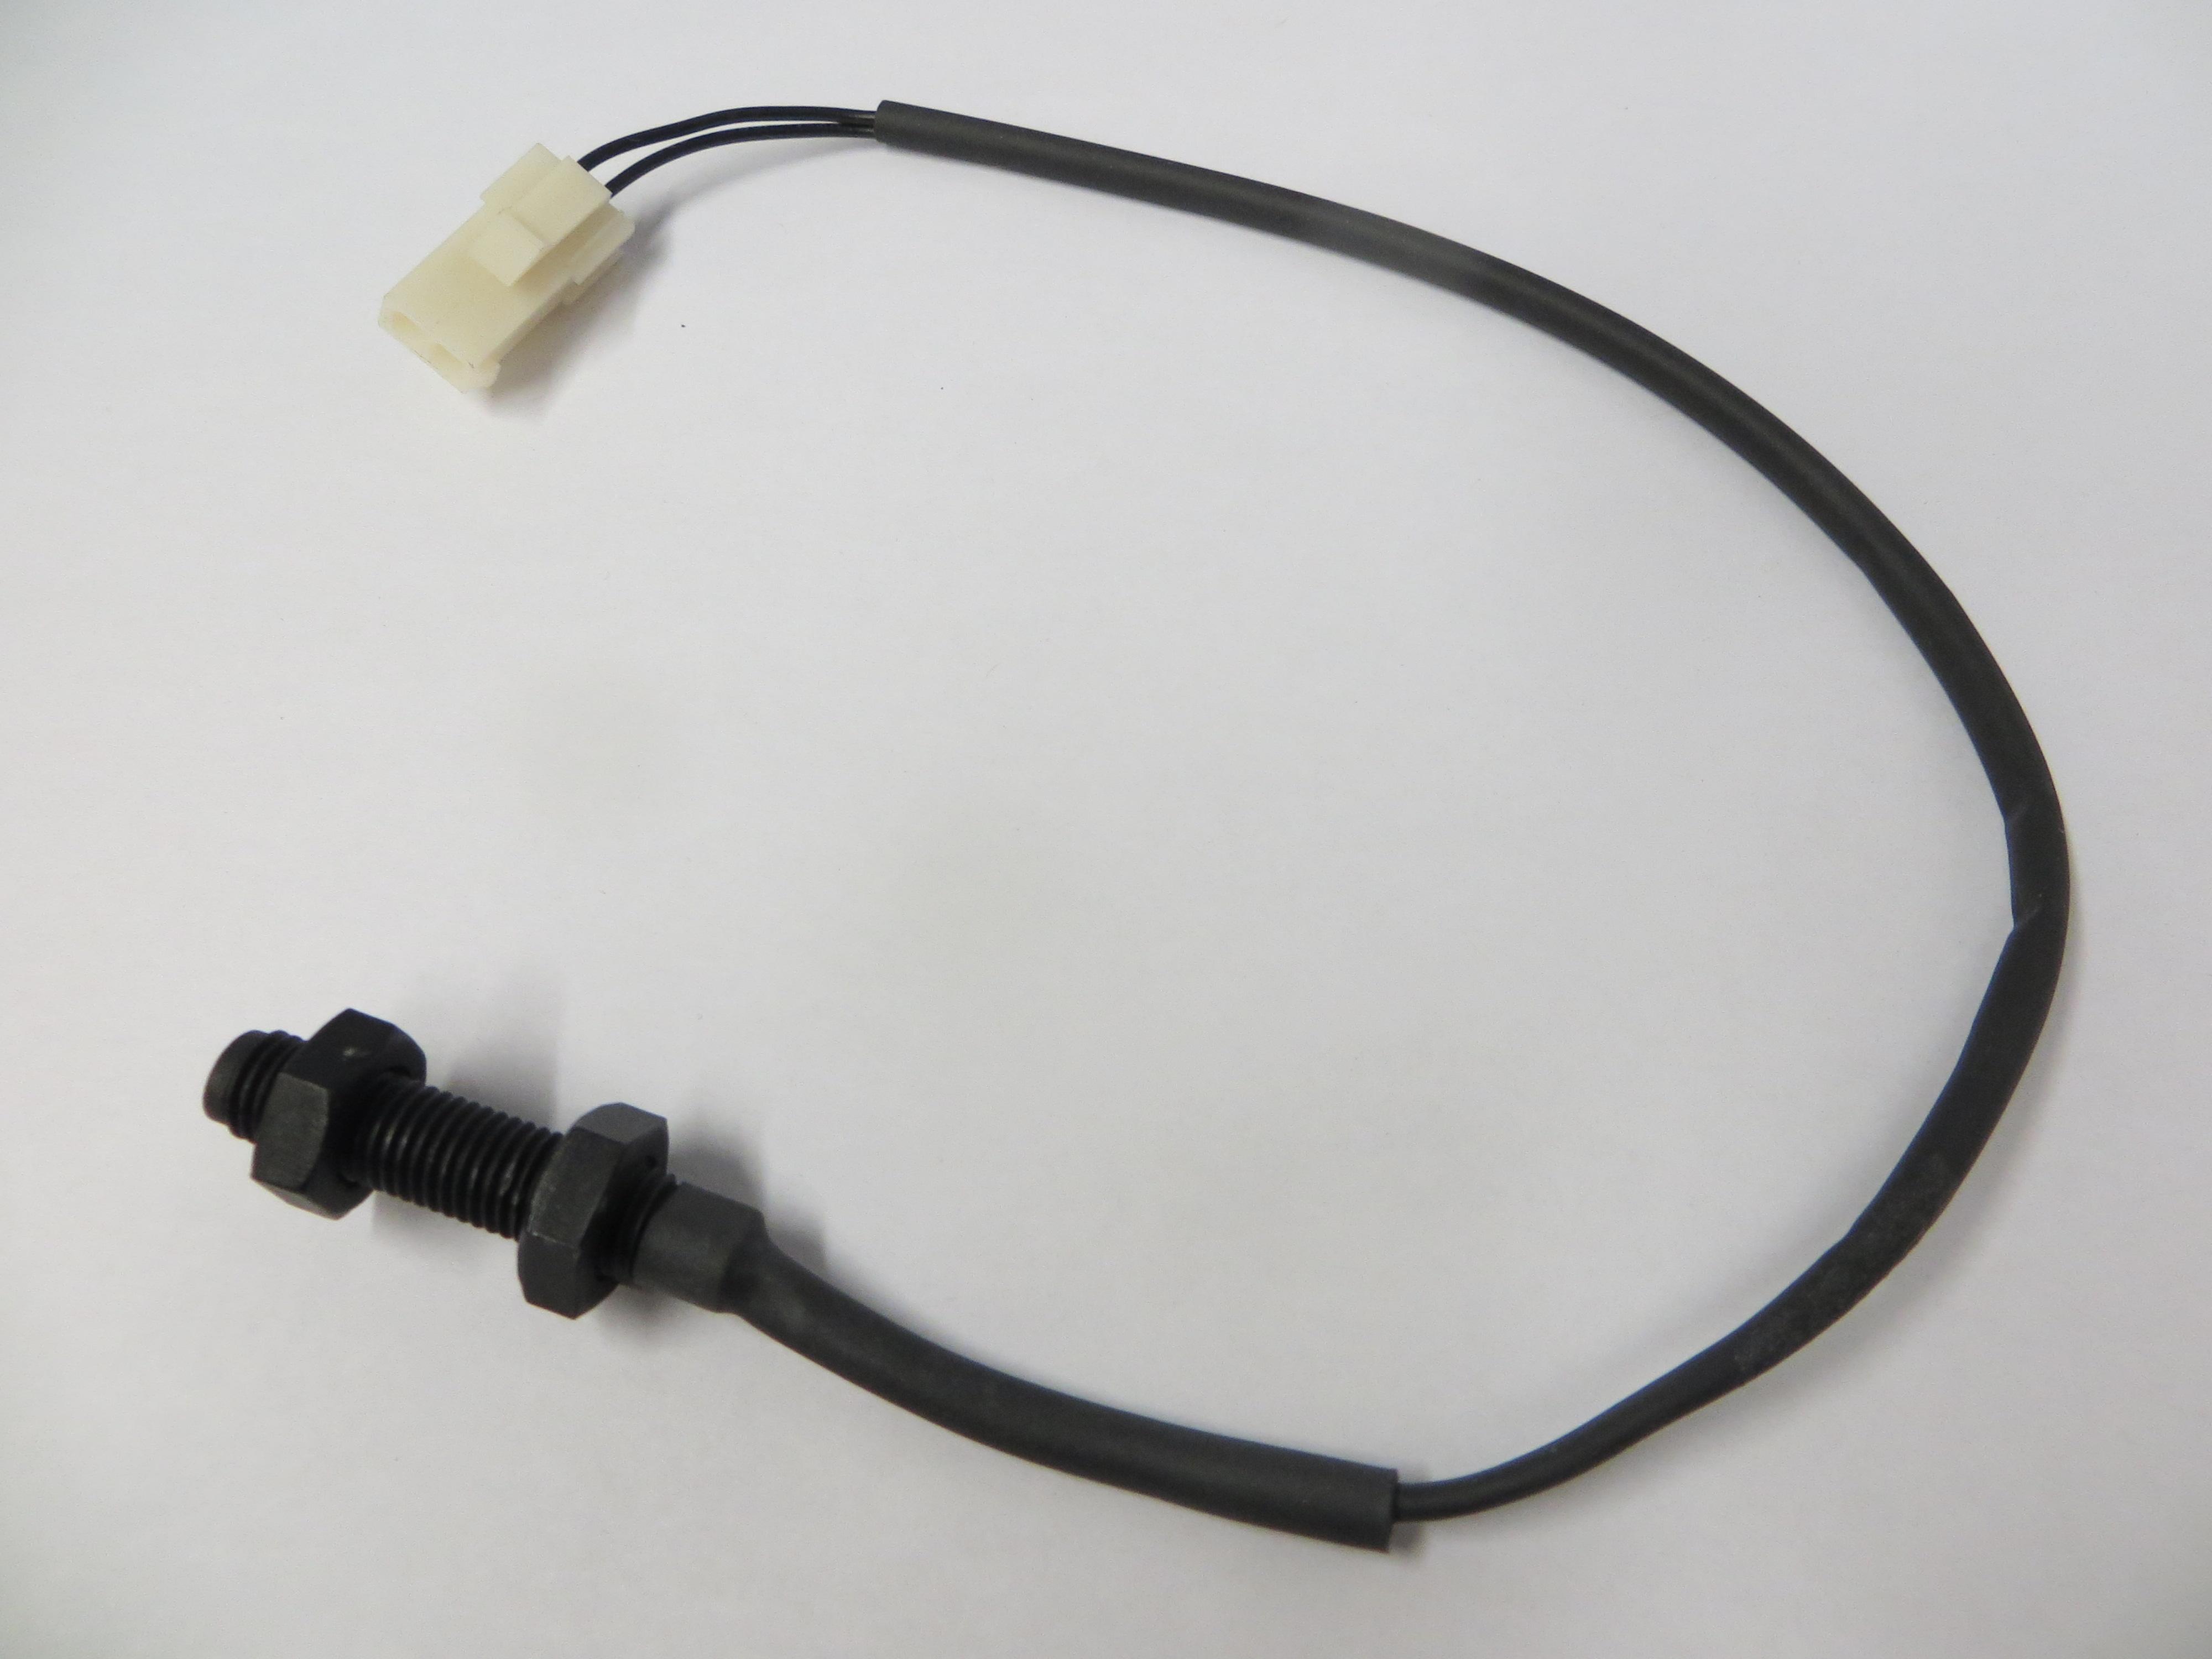 822735 - Rotation Sensor Phase 7